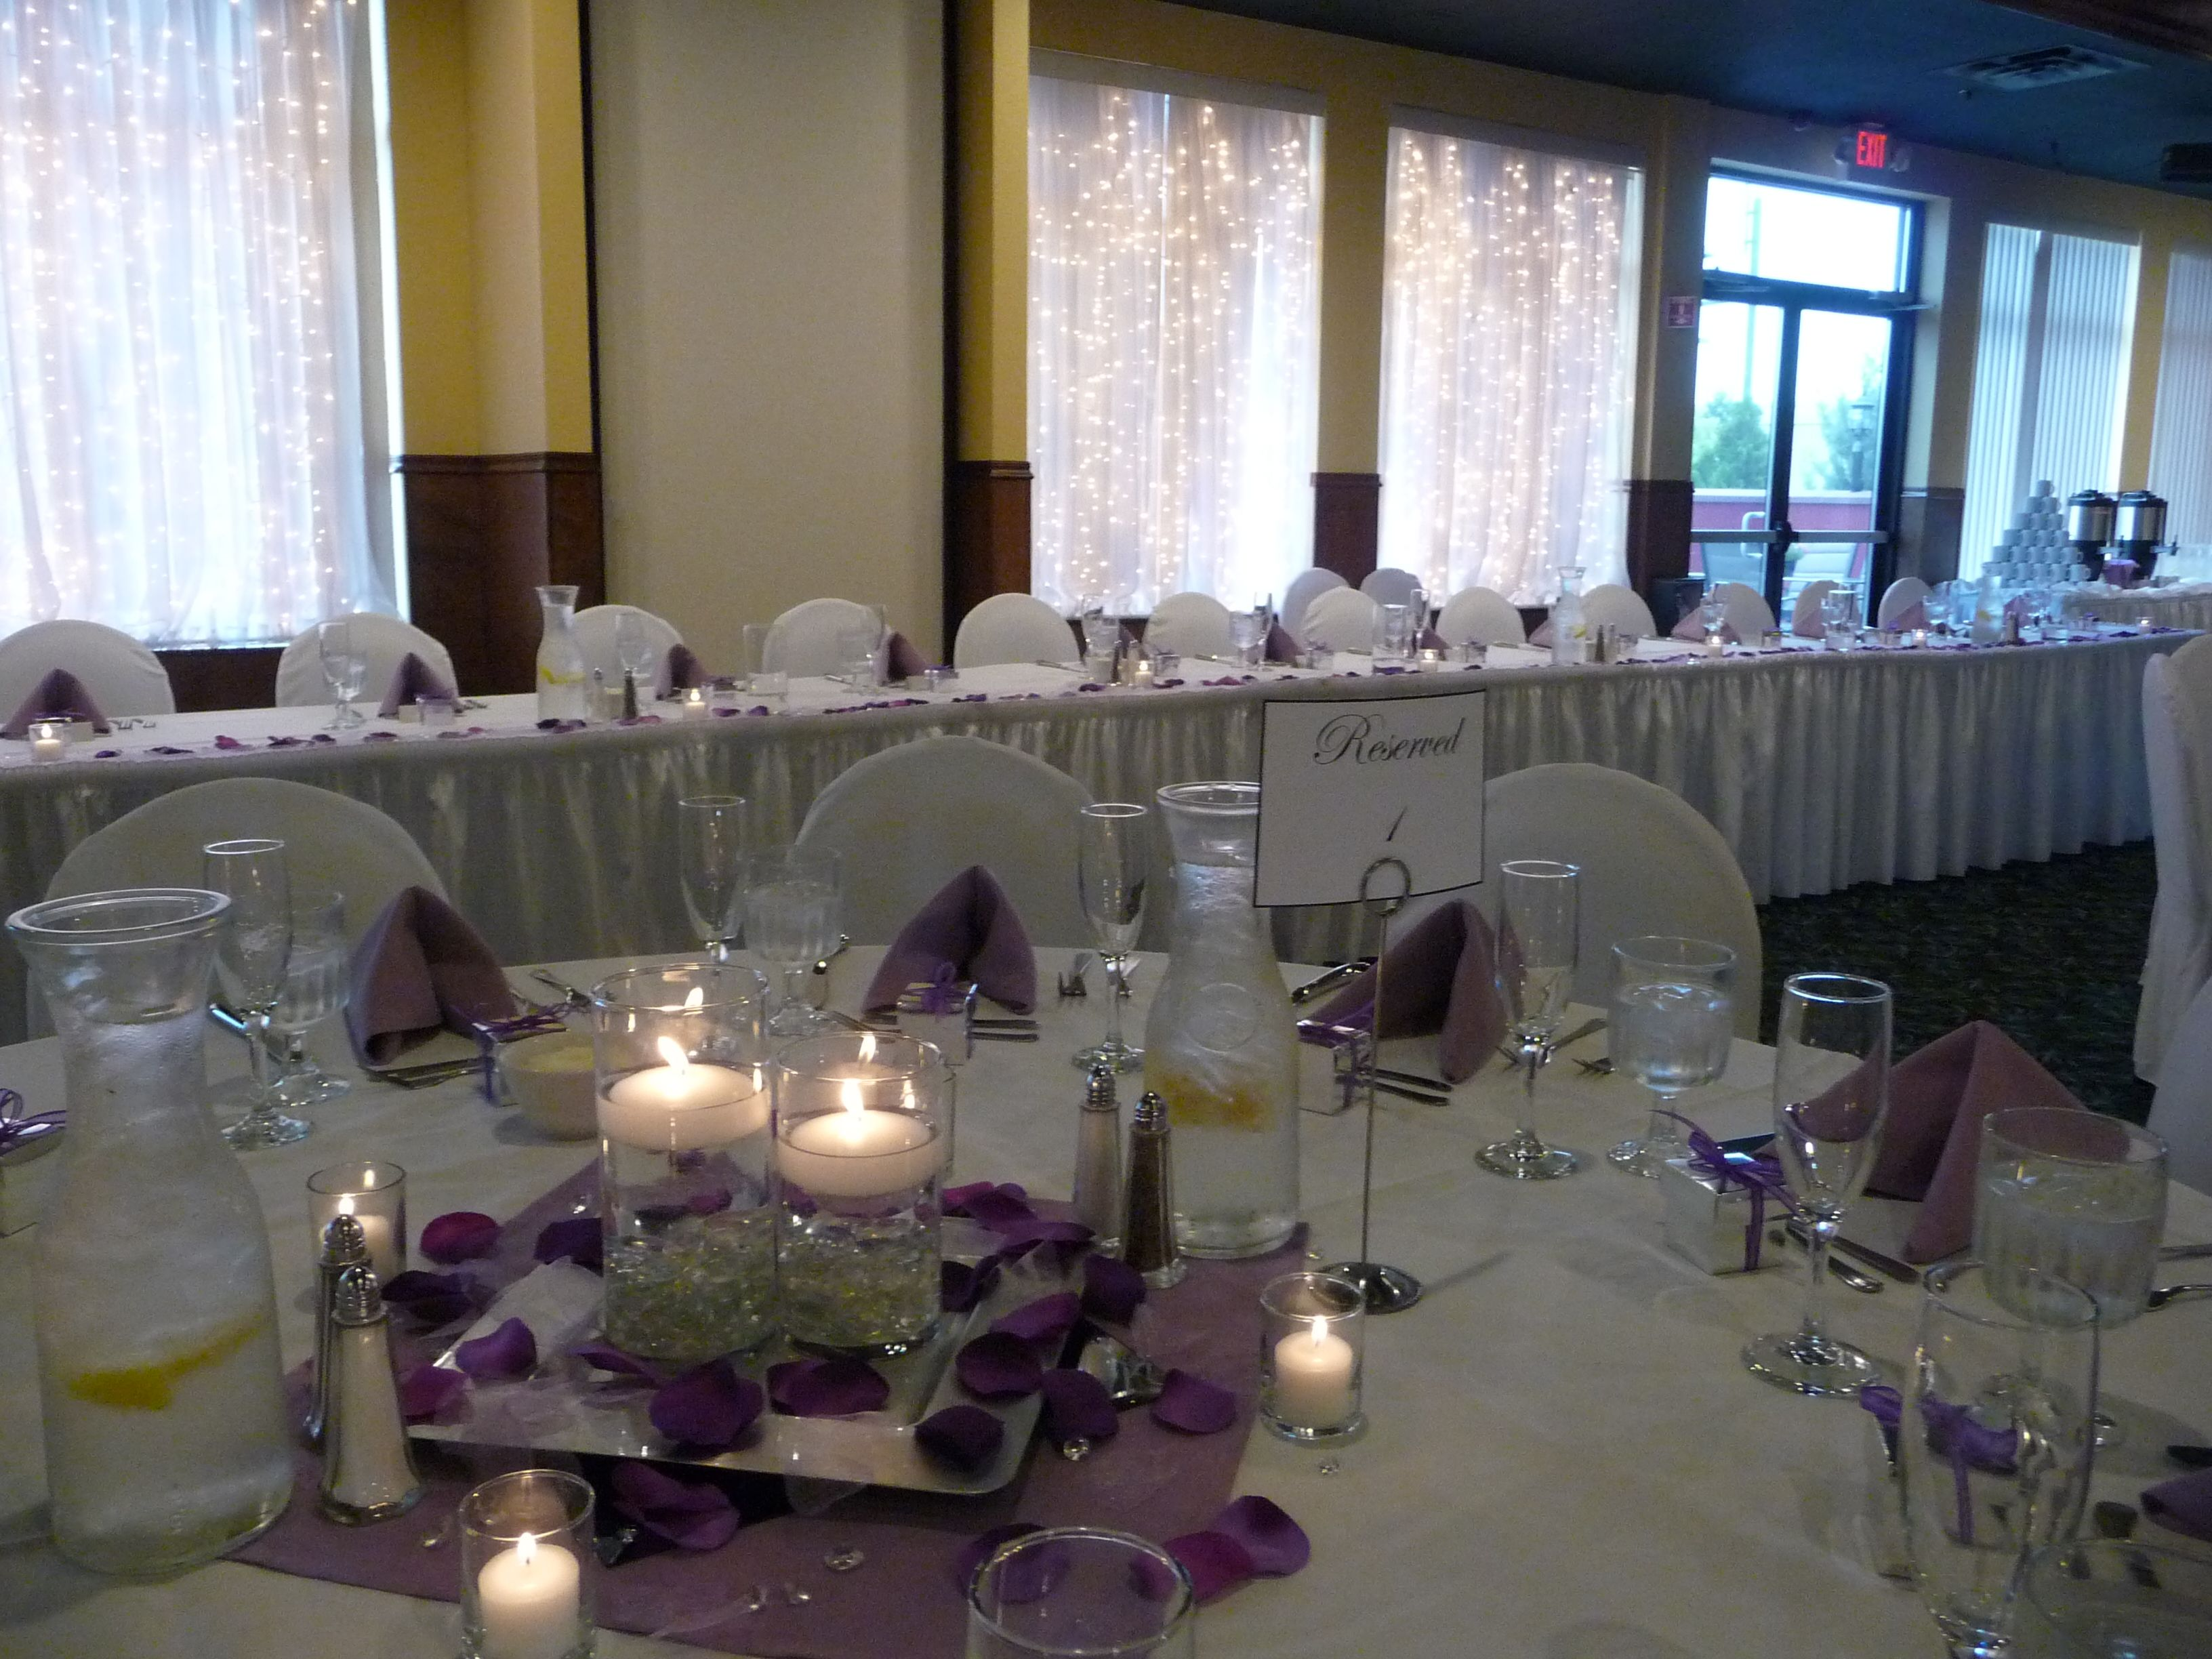 Tovsen Wedding 8.2.14 Rockwoods Banquet Center. Purple Centerpieces, floating candles, 3 tier vases. Reserve Table 1 www.rockwoodsgrill.com